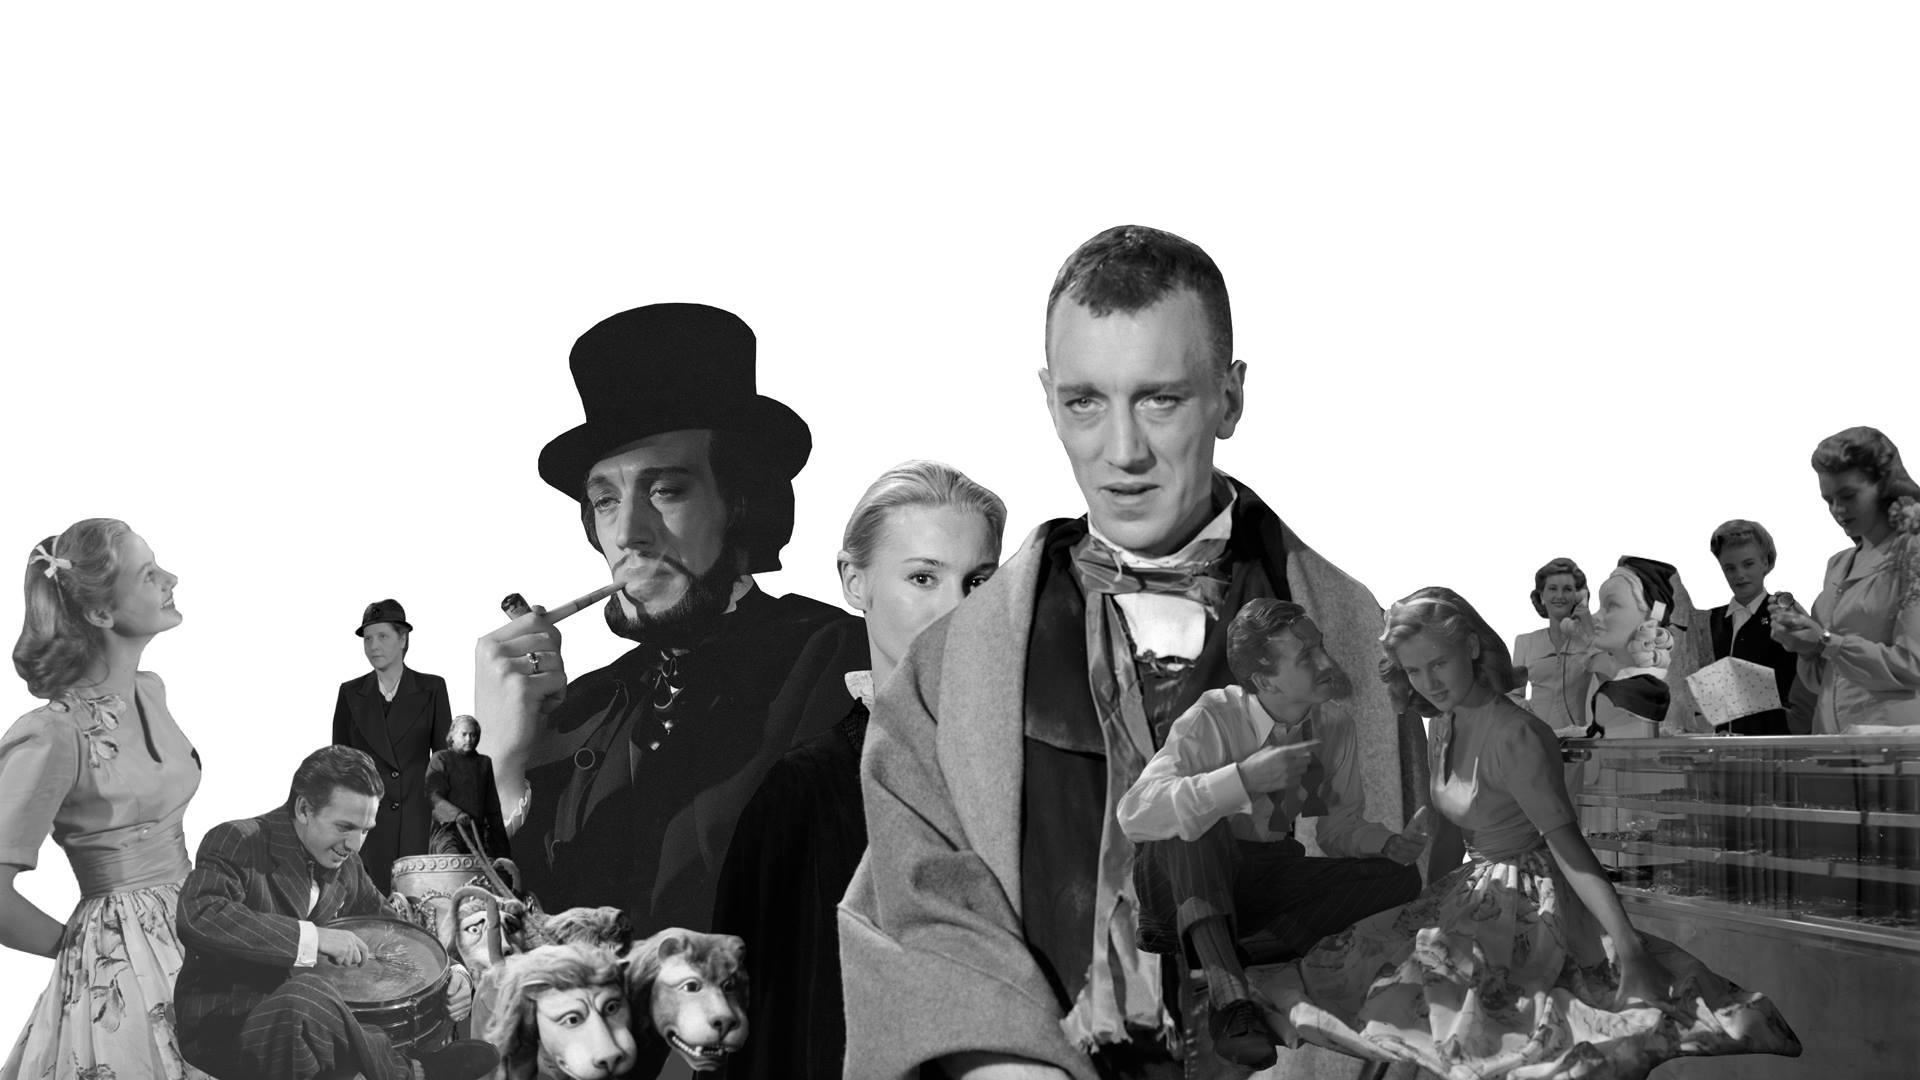 Bergman'a Övgü, 29 Aralık'a kadar, Pera Müzesi